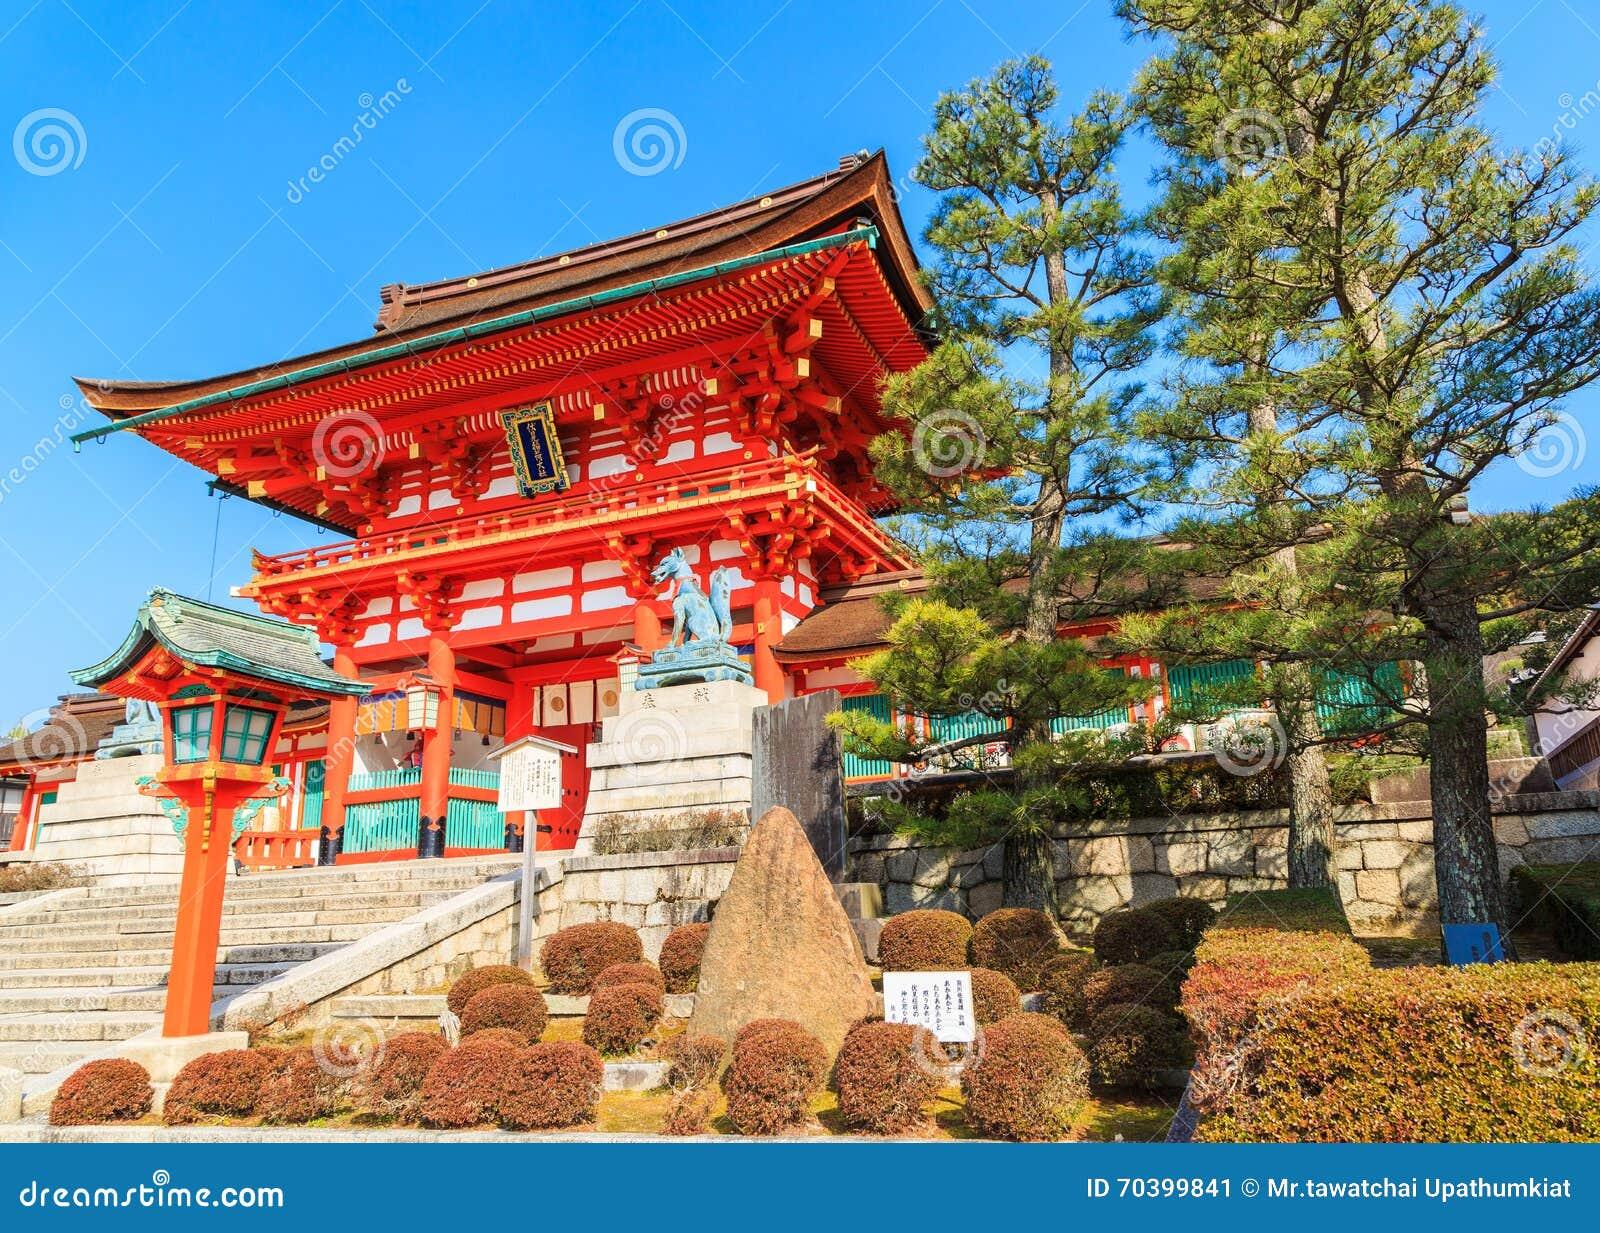 Oude Japanse houten poort en tuin met blauwe hemel, Kyoto, Japa